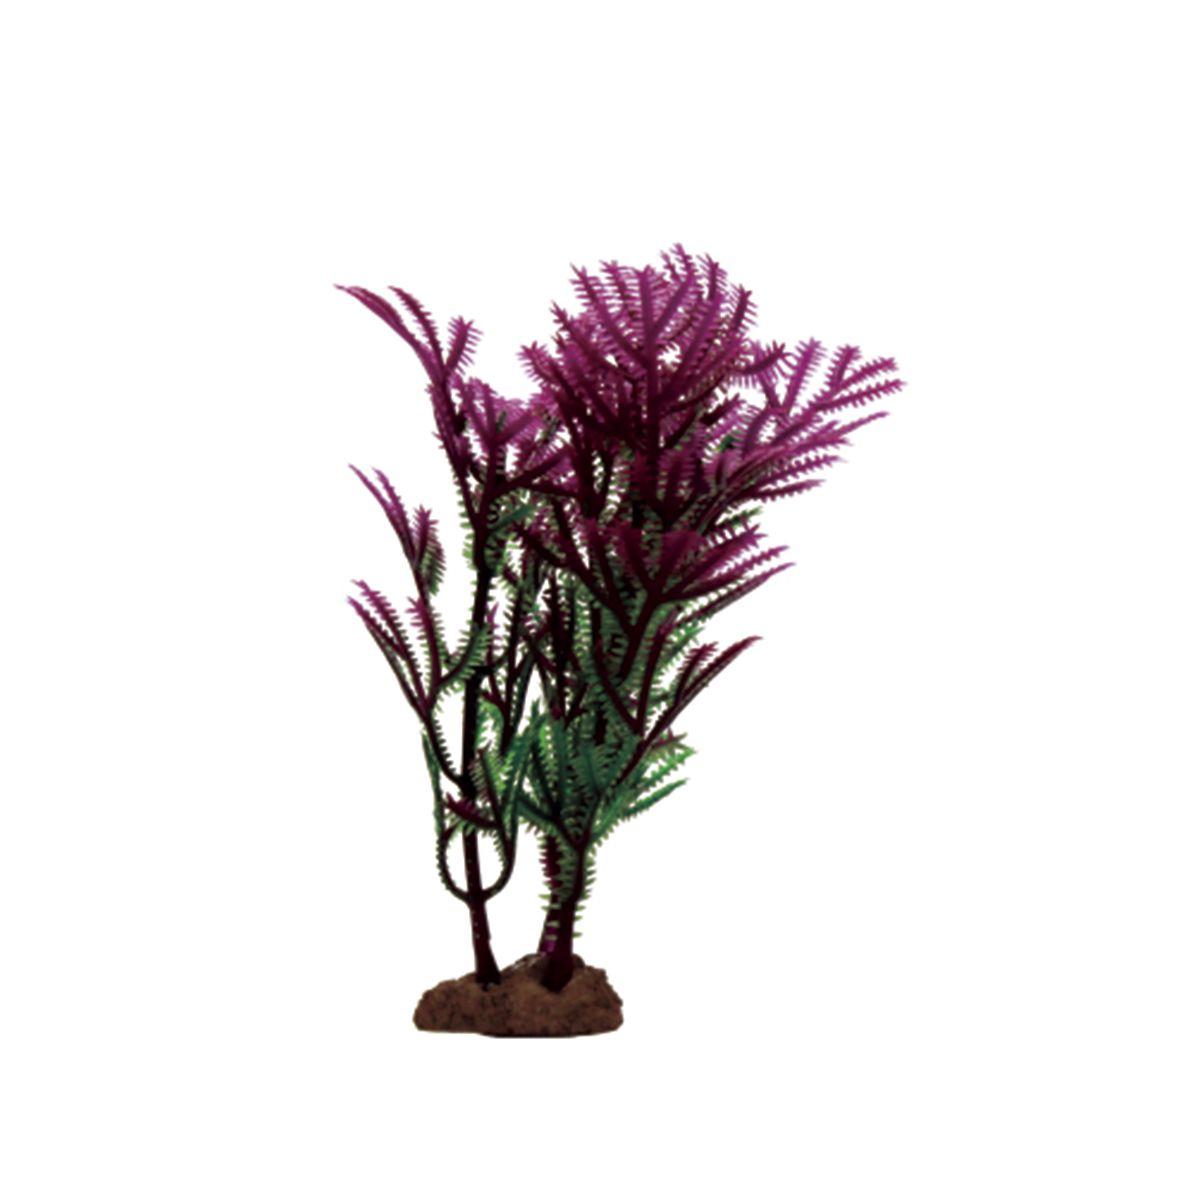 Растение для аквариума ArtUniq Хоттиния фиолетовая, высота 10 см, 6 штART-1170529Растение для аквариума ArtUniq Хоттиния фиолетовая, высота 10 см, 6 шт